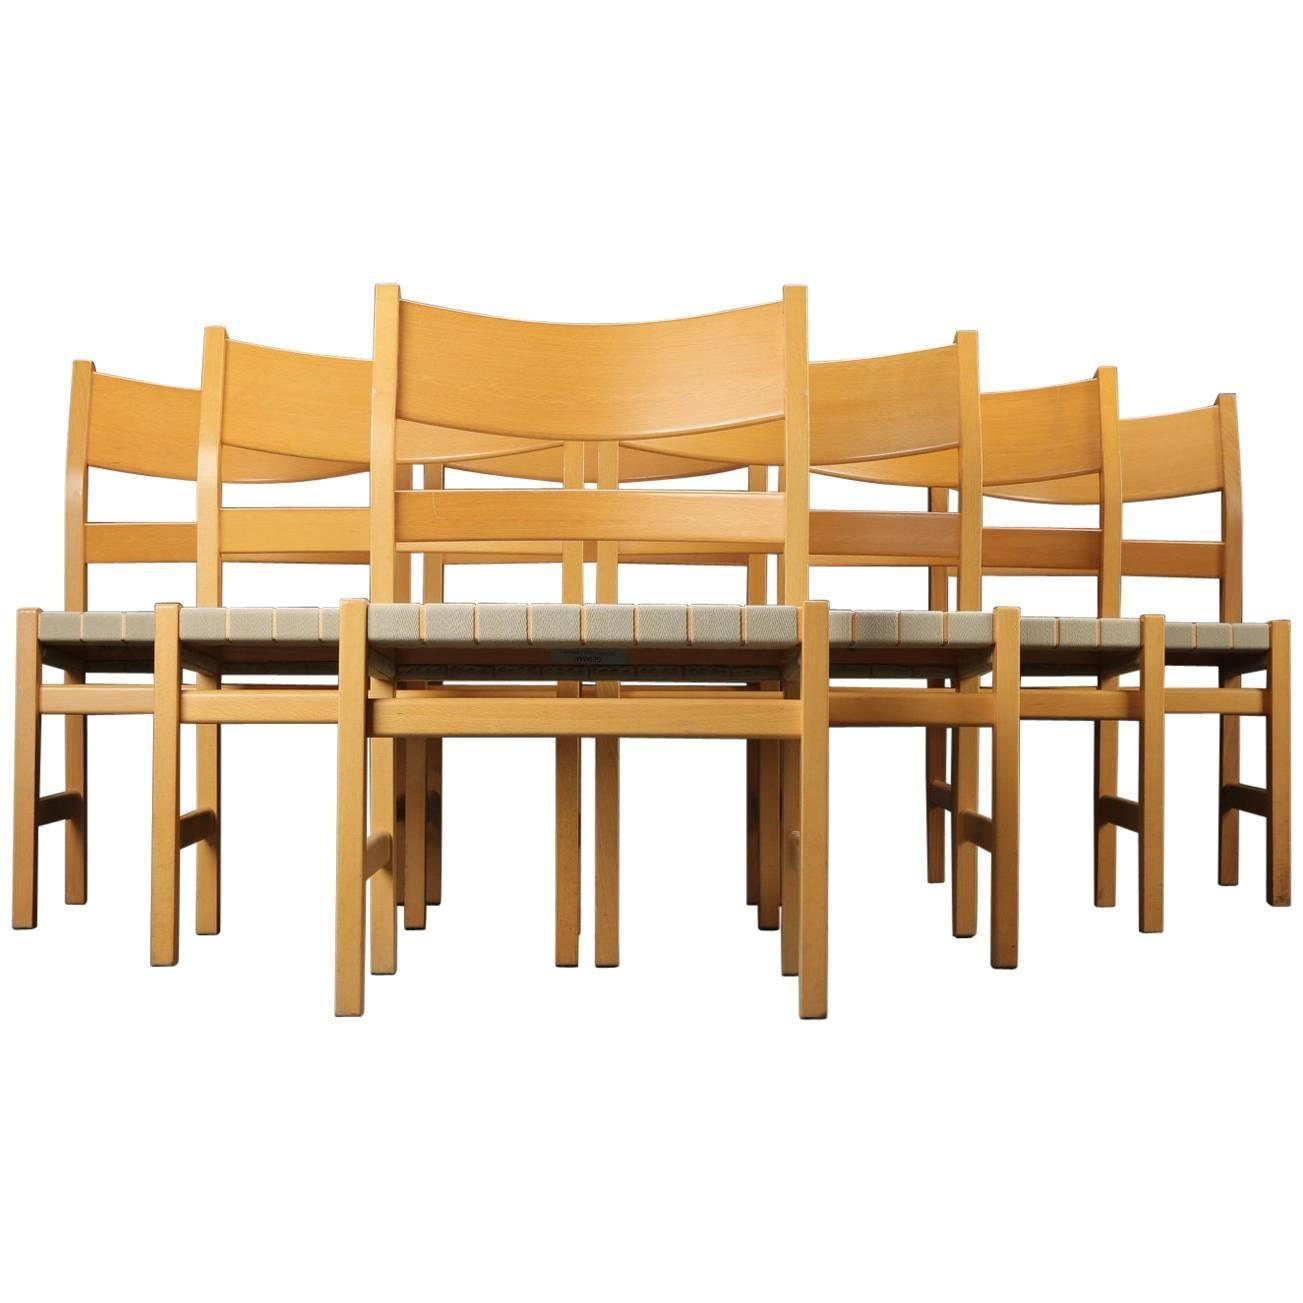 Wonderful Set Of Seven Wegner Koldinghus Dining Chairs In Beech And Woven Seat,  GETAMA 1